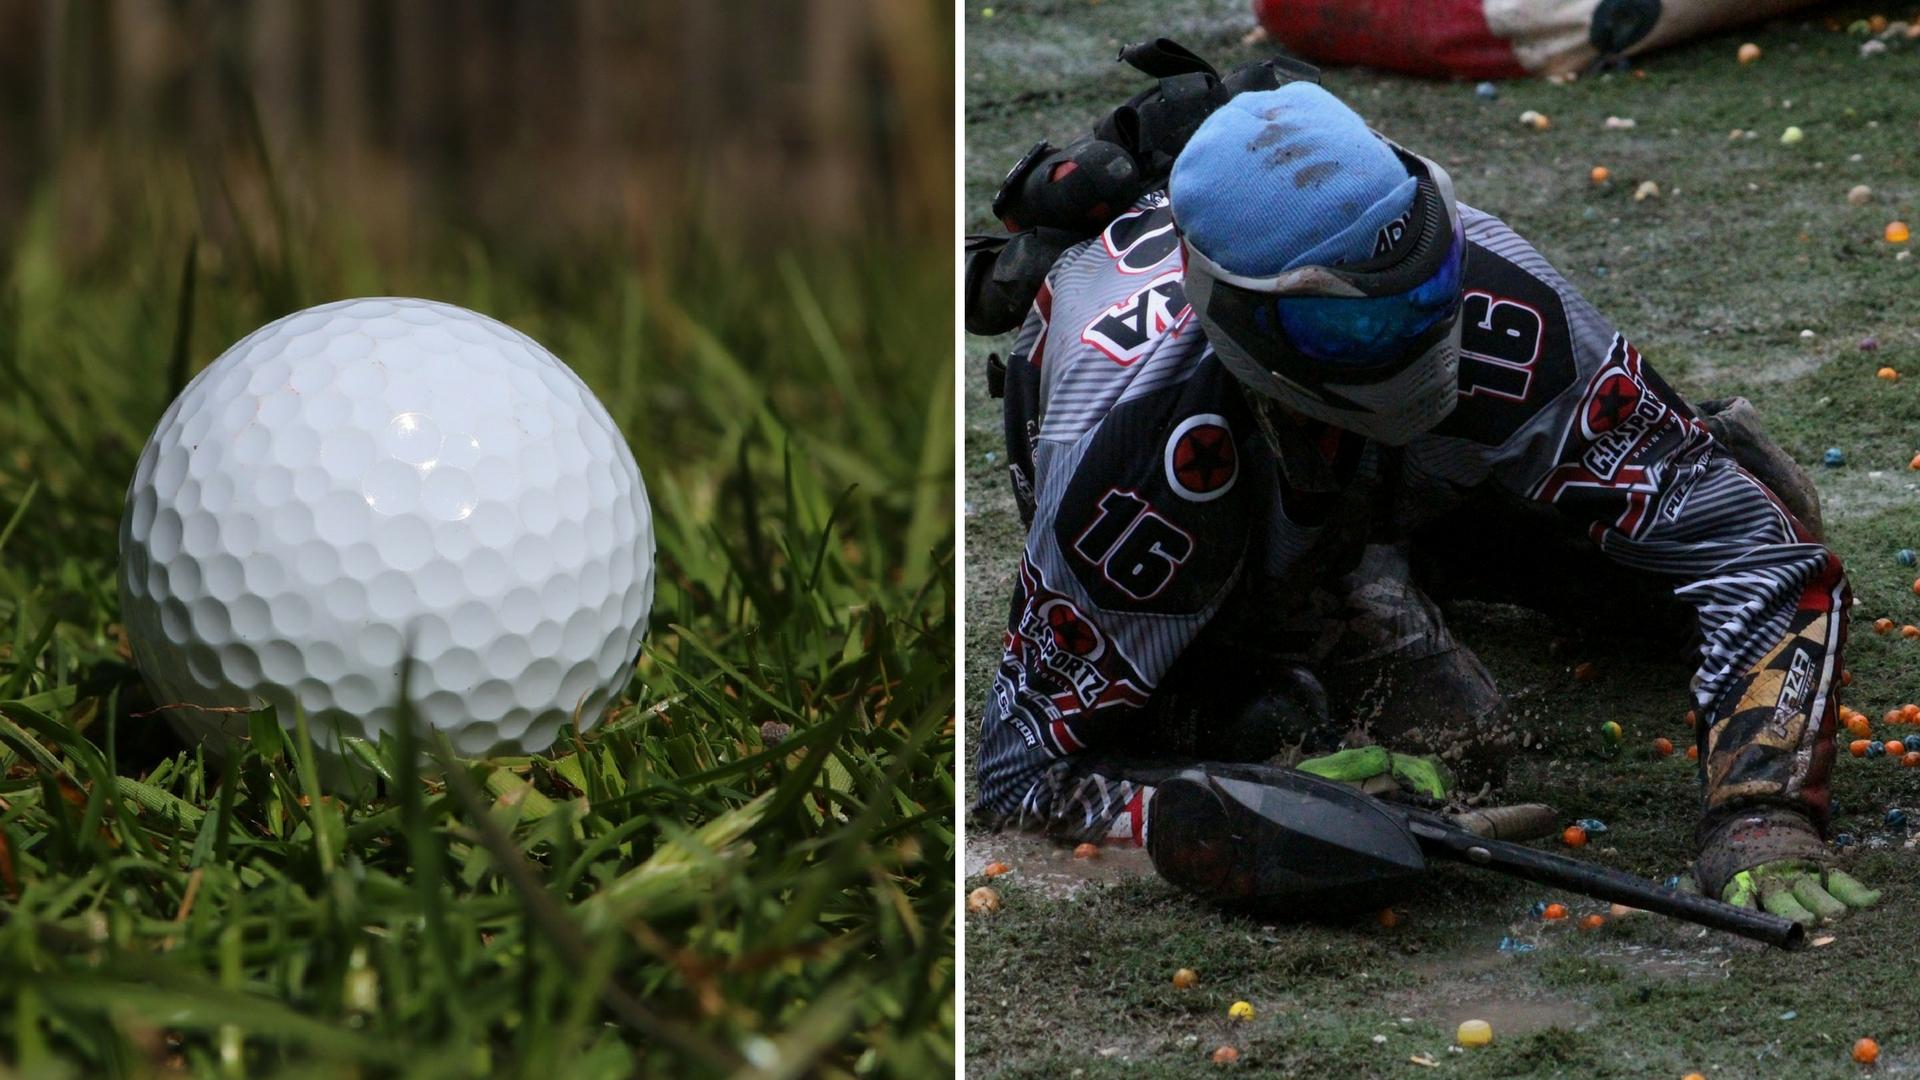 Gol y paintball, deportes antiestrés